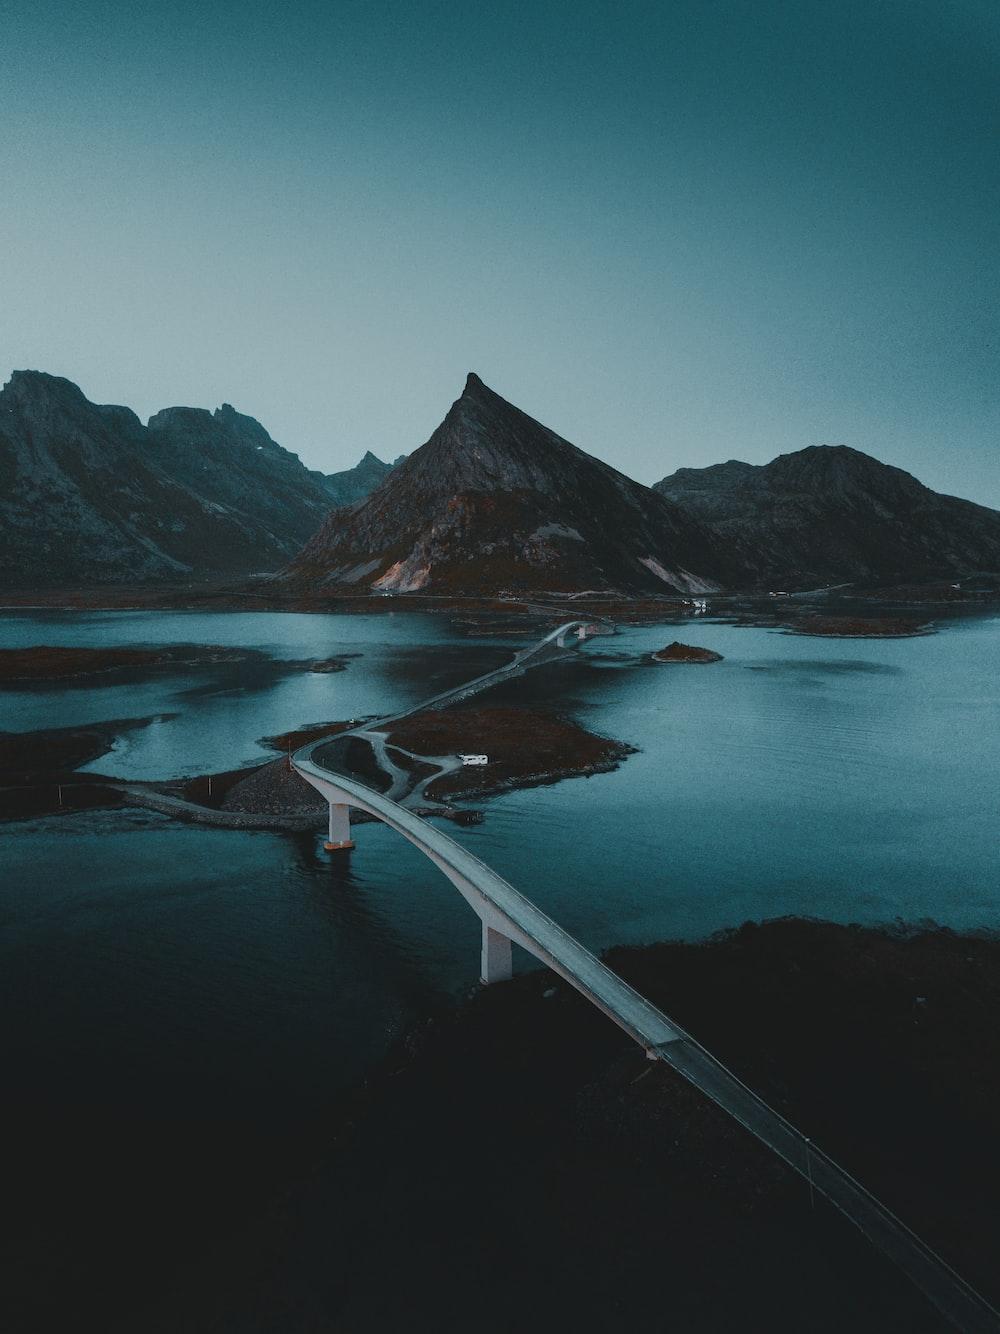 white bridge across lake and mountain during daytime